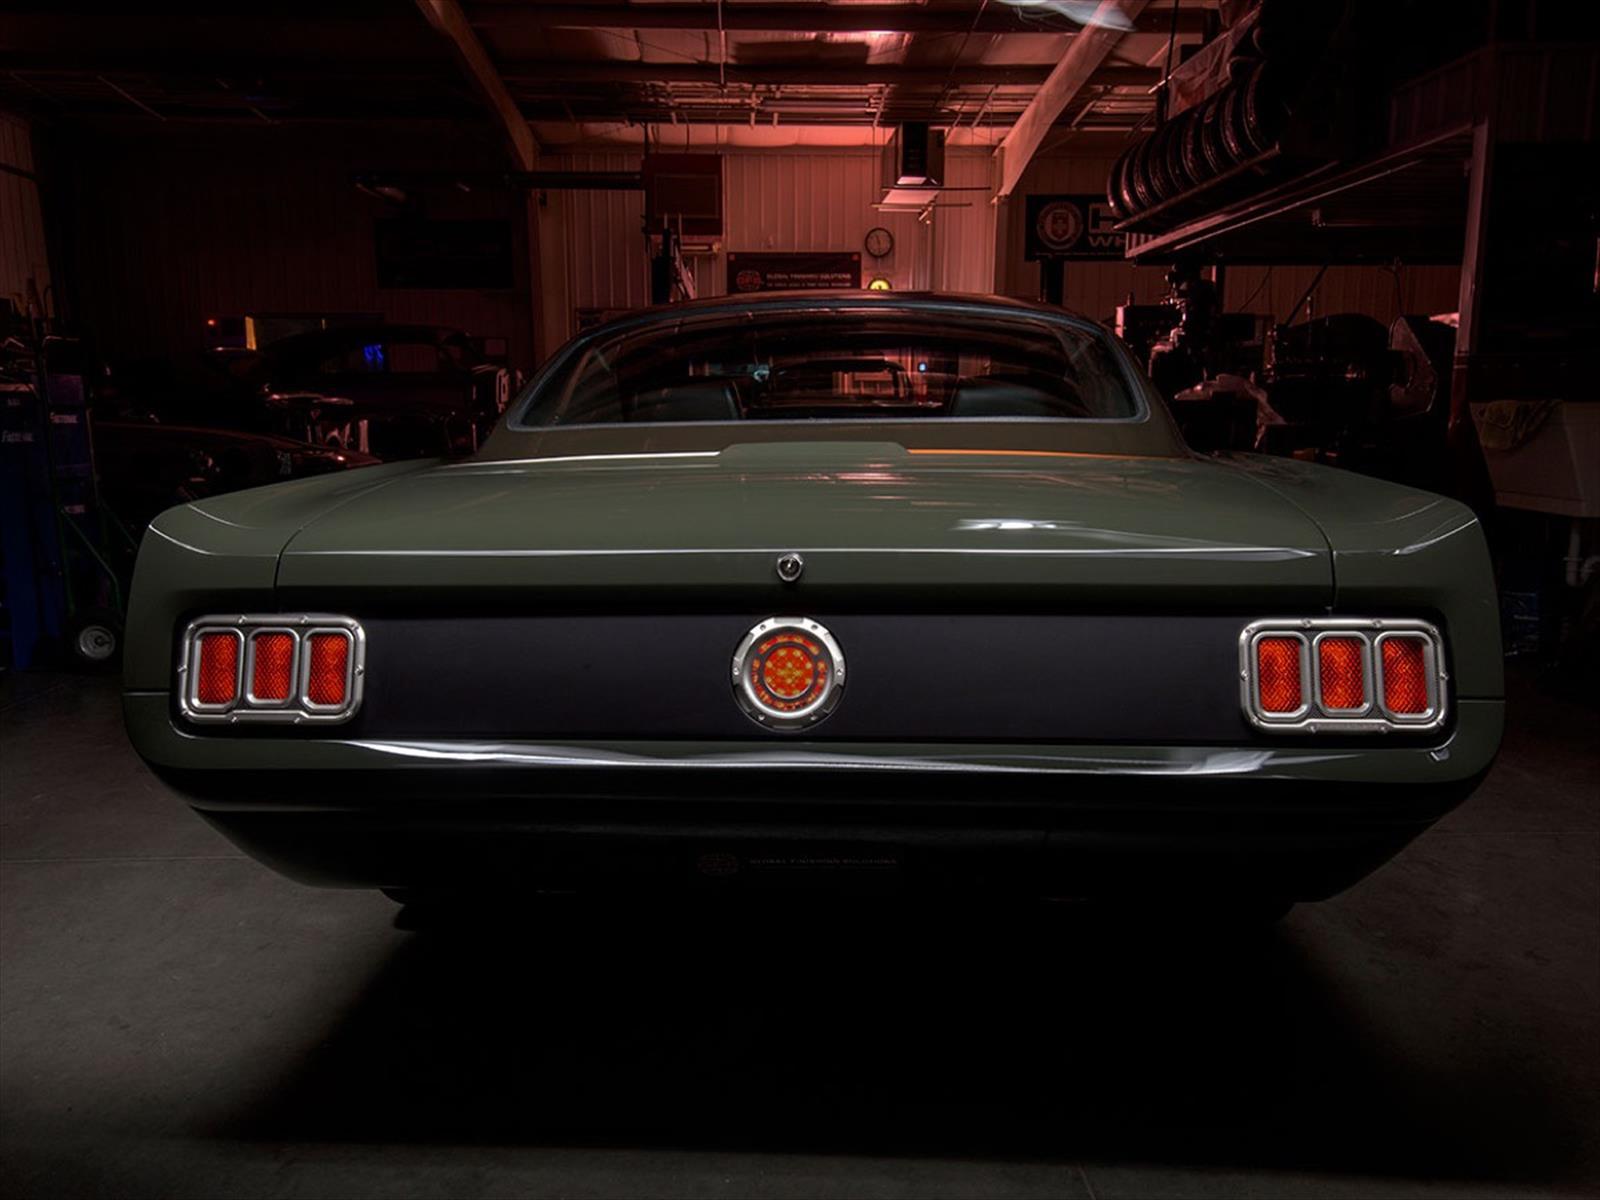 Ford Escape Se >> Ford Mustang Espionage 1965 por Ringbrothers, un muscle car magistral - Autocosmos.com